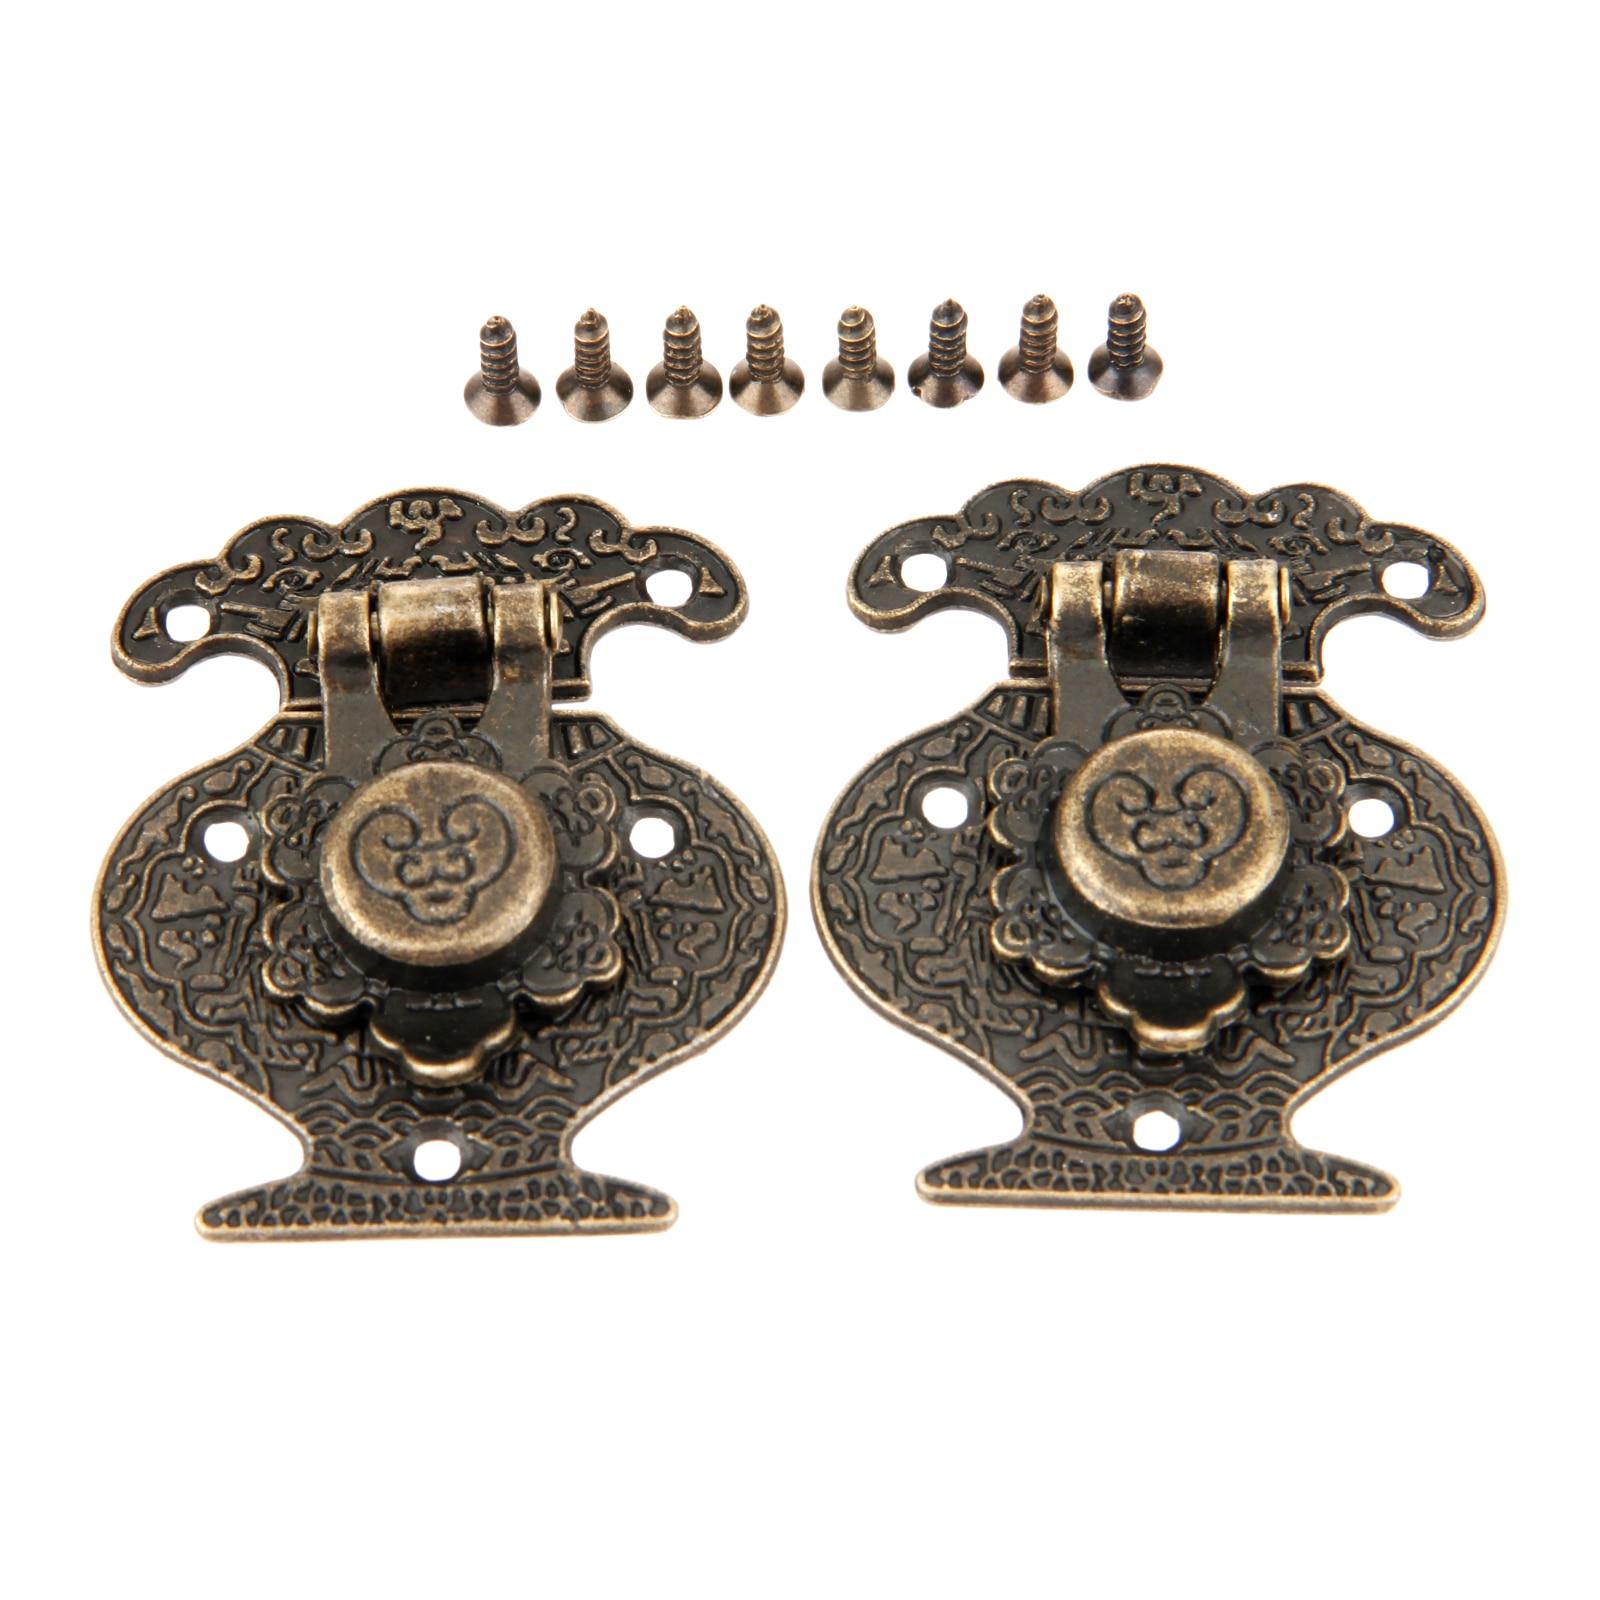 2Pcs Wooden Jewellery Box Vase Buckle Metal Box Hasp Latch Lock Decorative Hasp Antique Bronze Pattern Carved 40mmx51mm